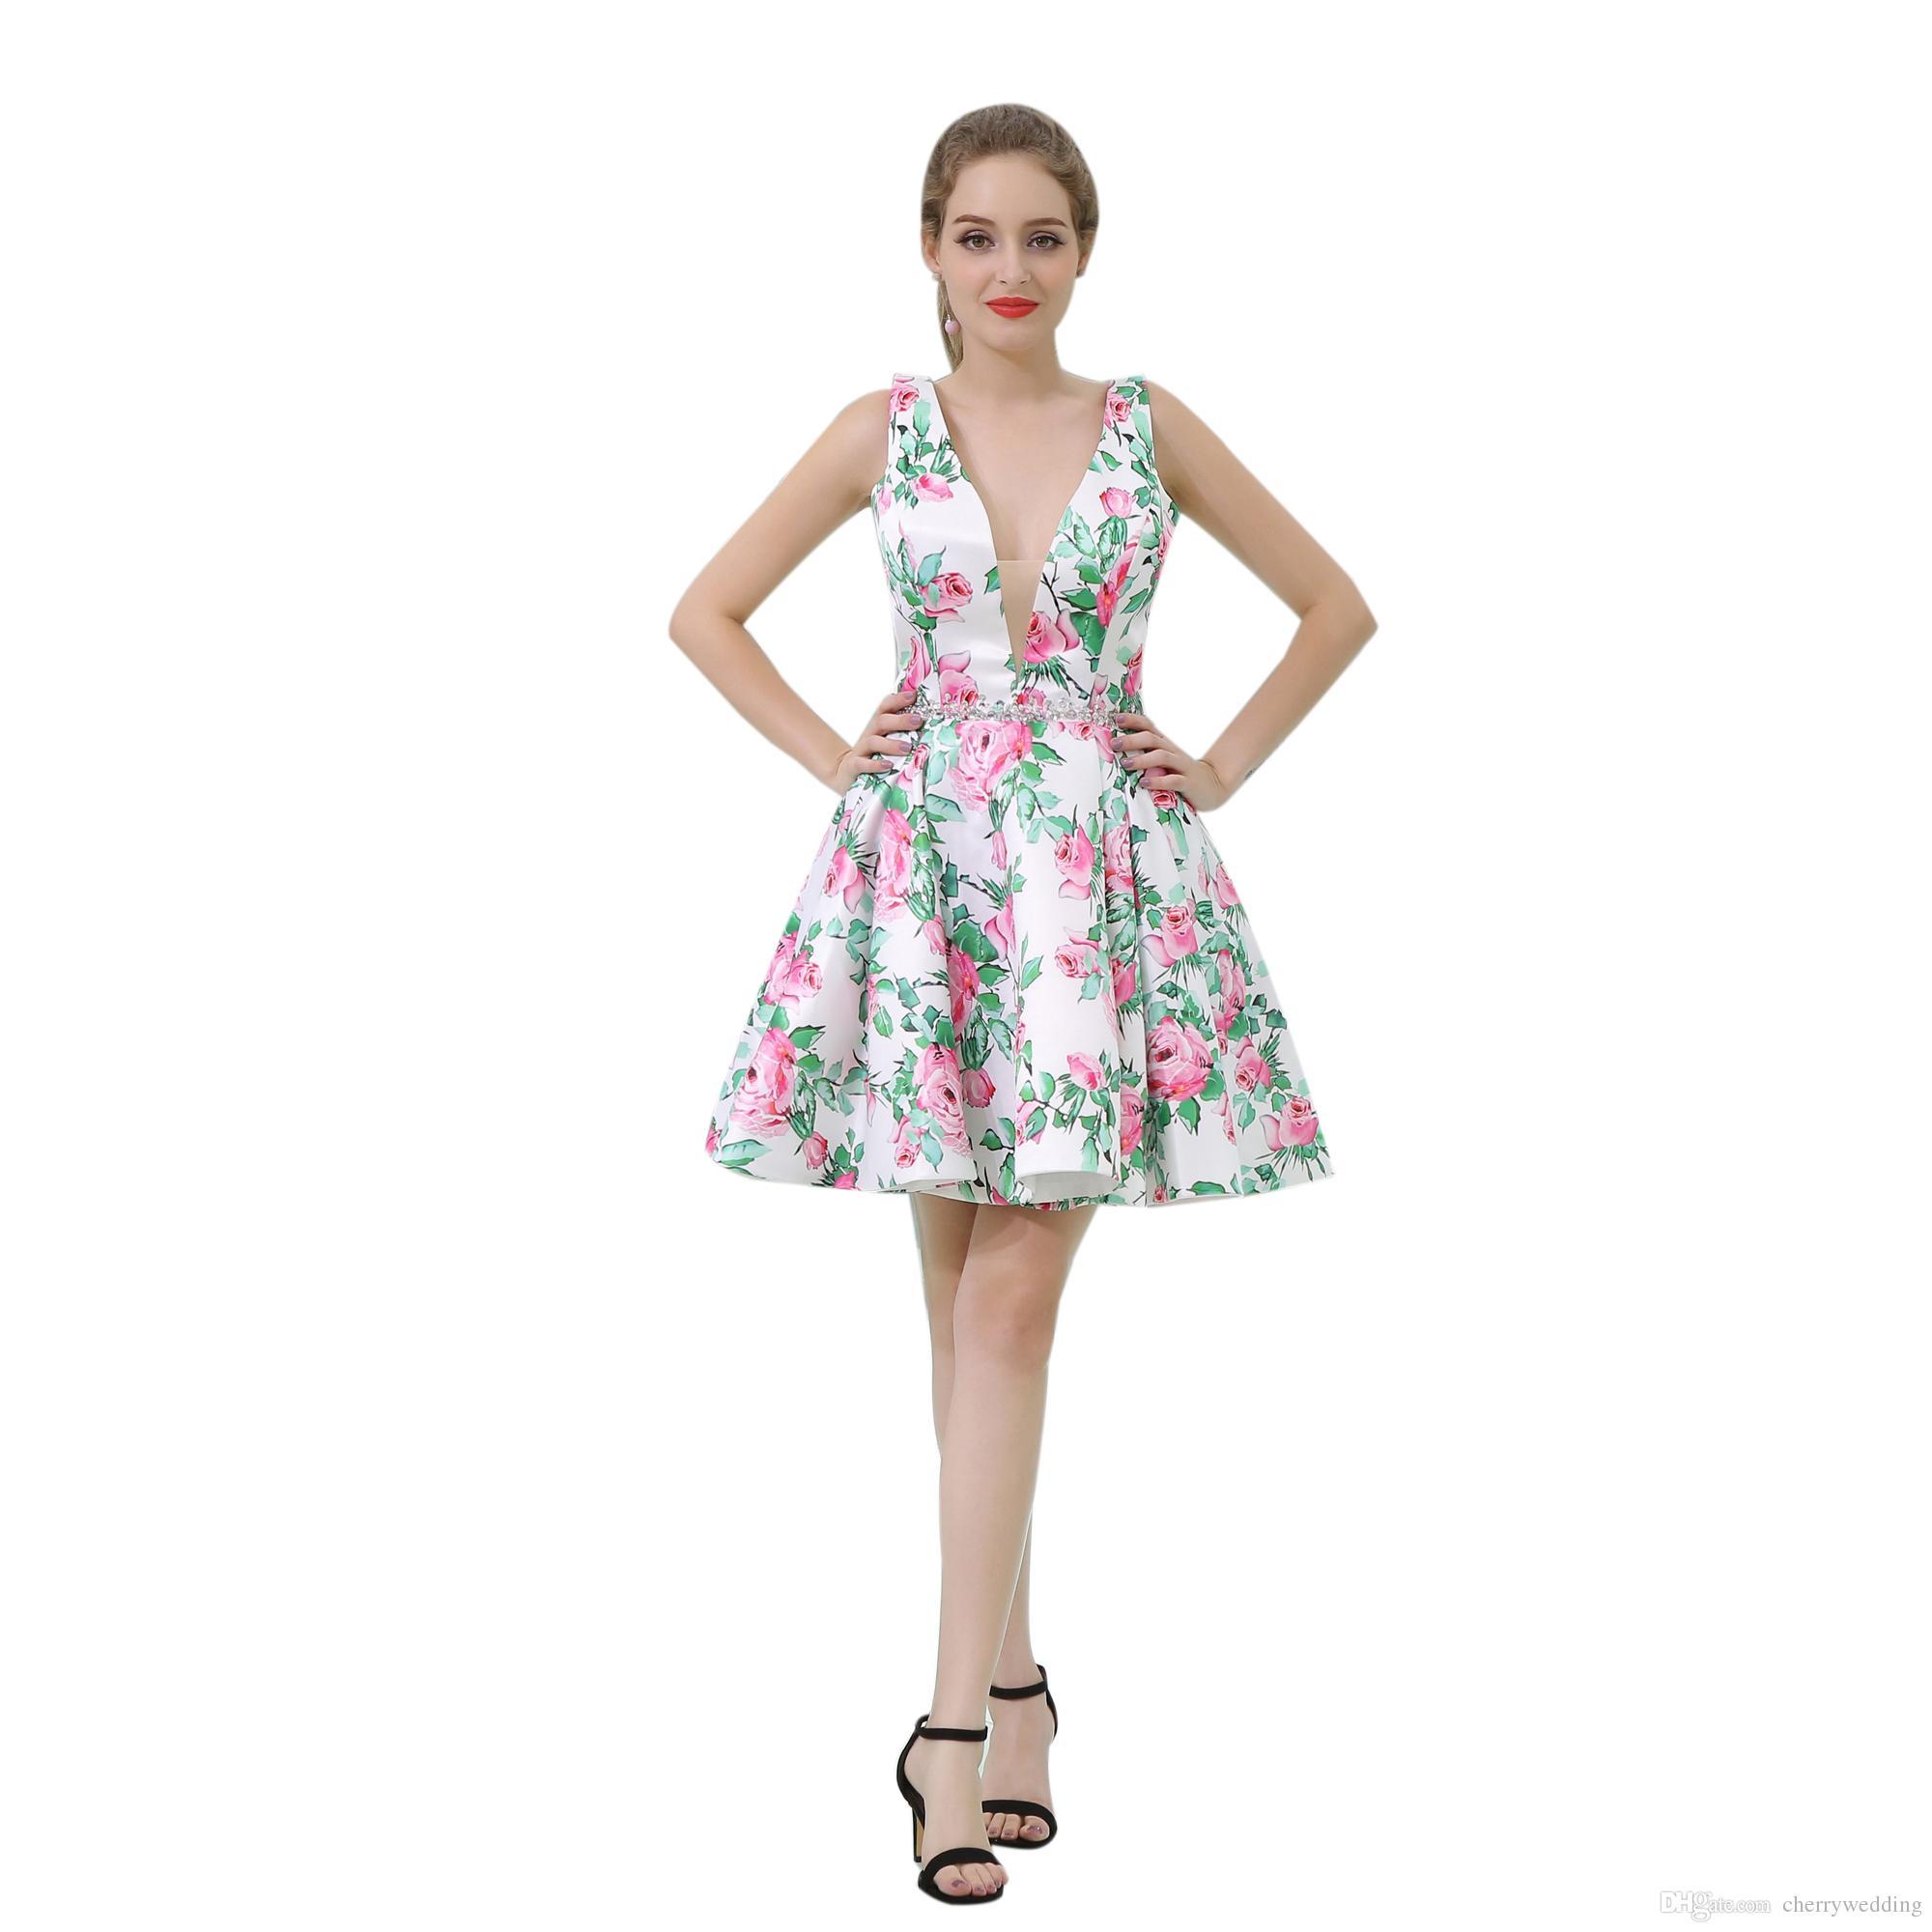 2a85a82540d 2019 Print Flower Fabric Short Mini Prom Dresses Short Evening Dress Deep V  Neck Homecoming Dress B056 Couture Prom Dresses Cute Short Prom Dresses  From ...